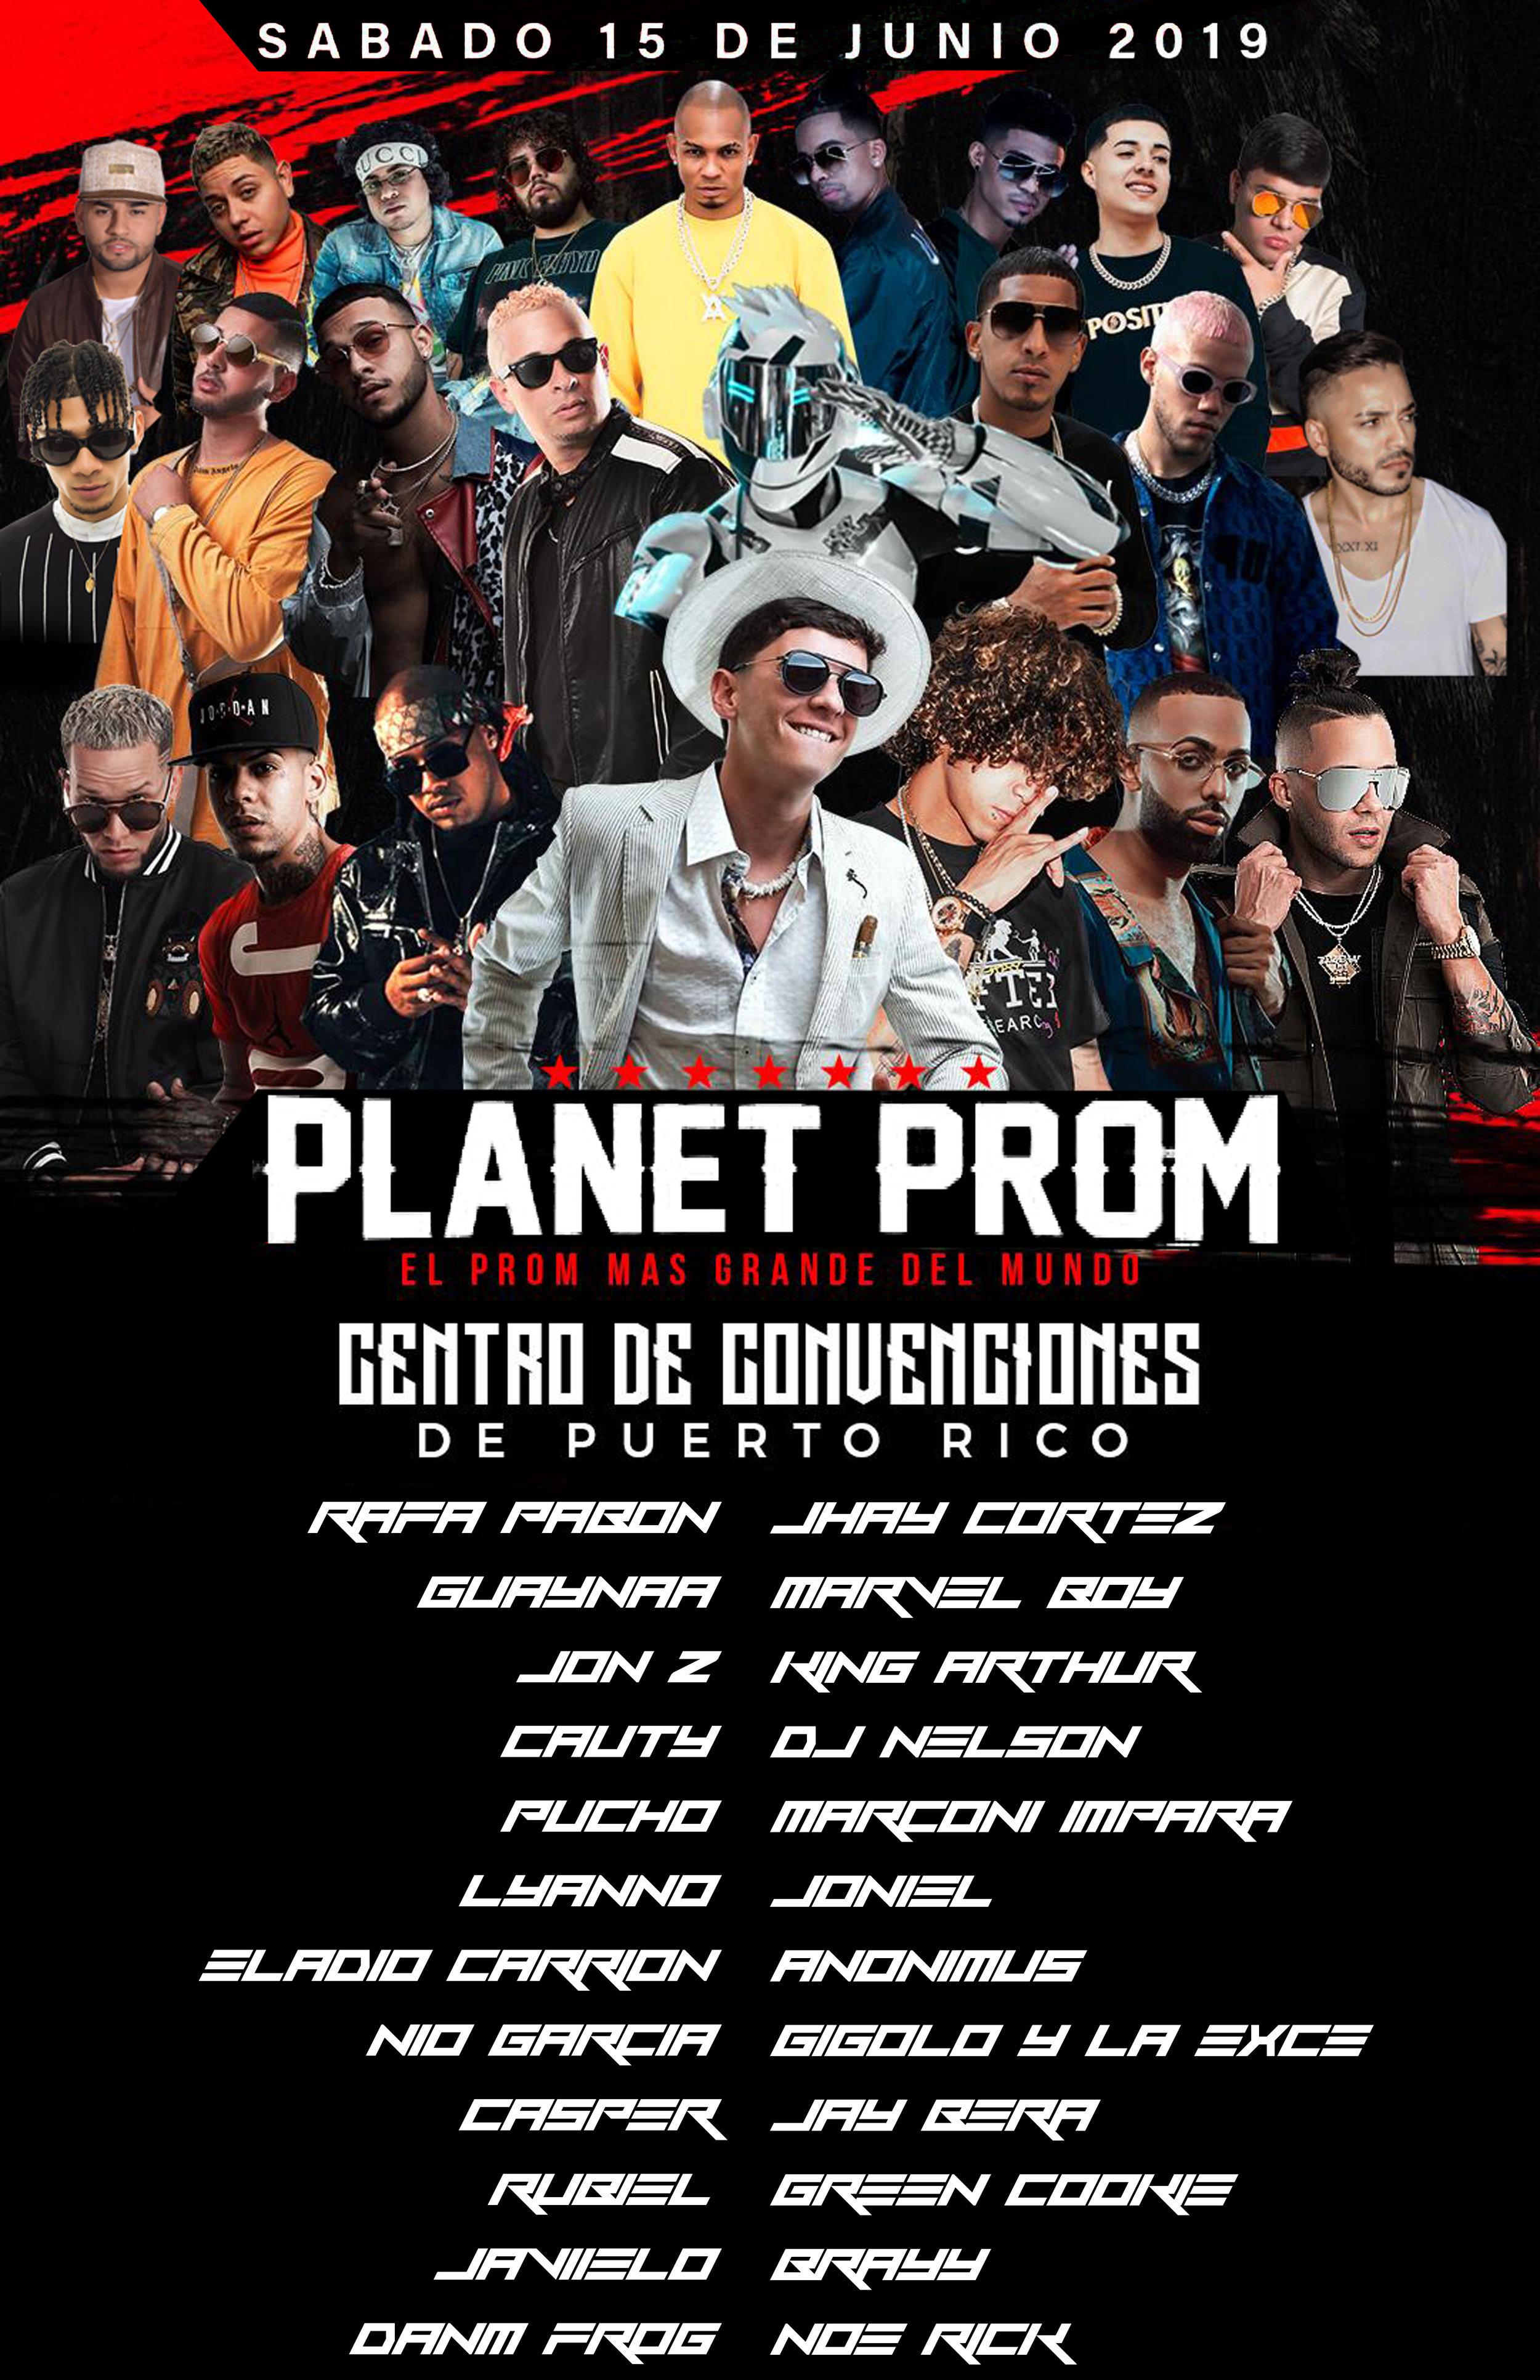 Planet Prom web3.jpg